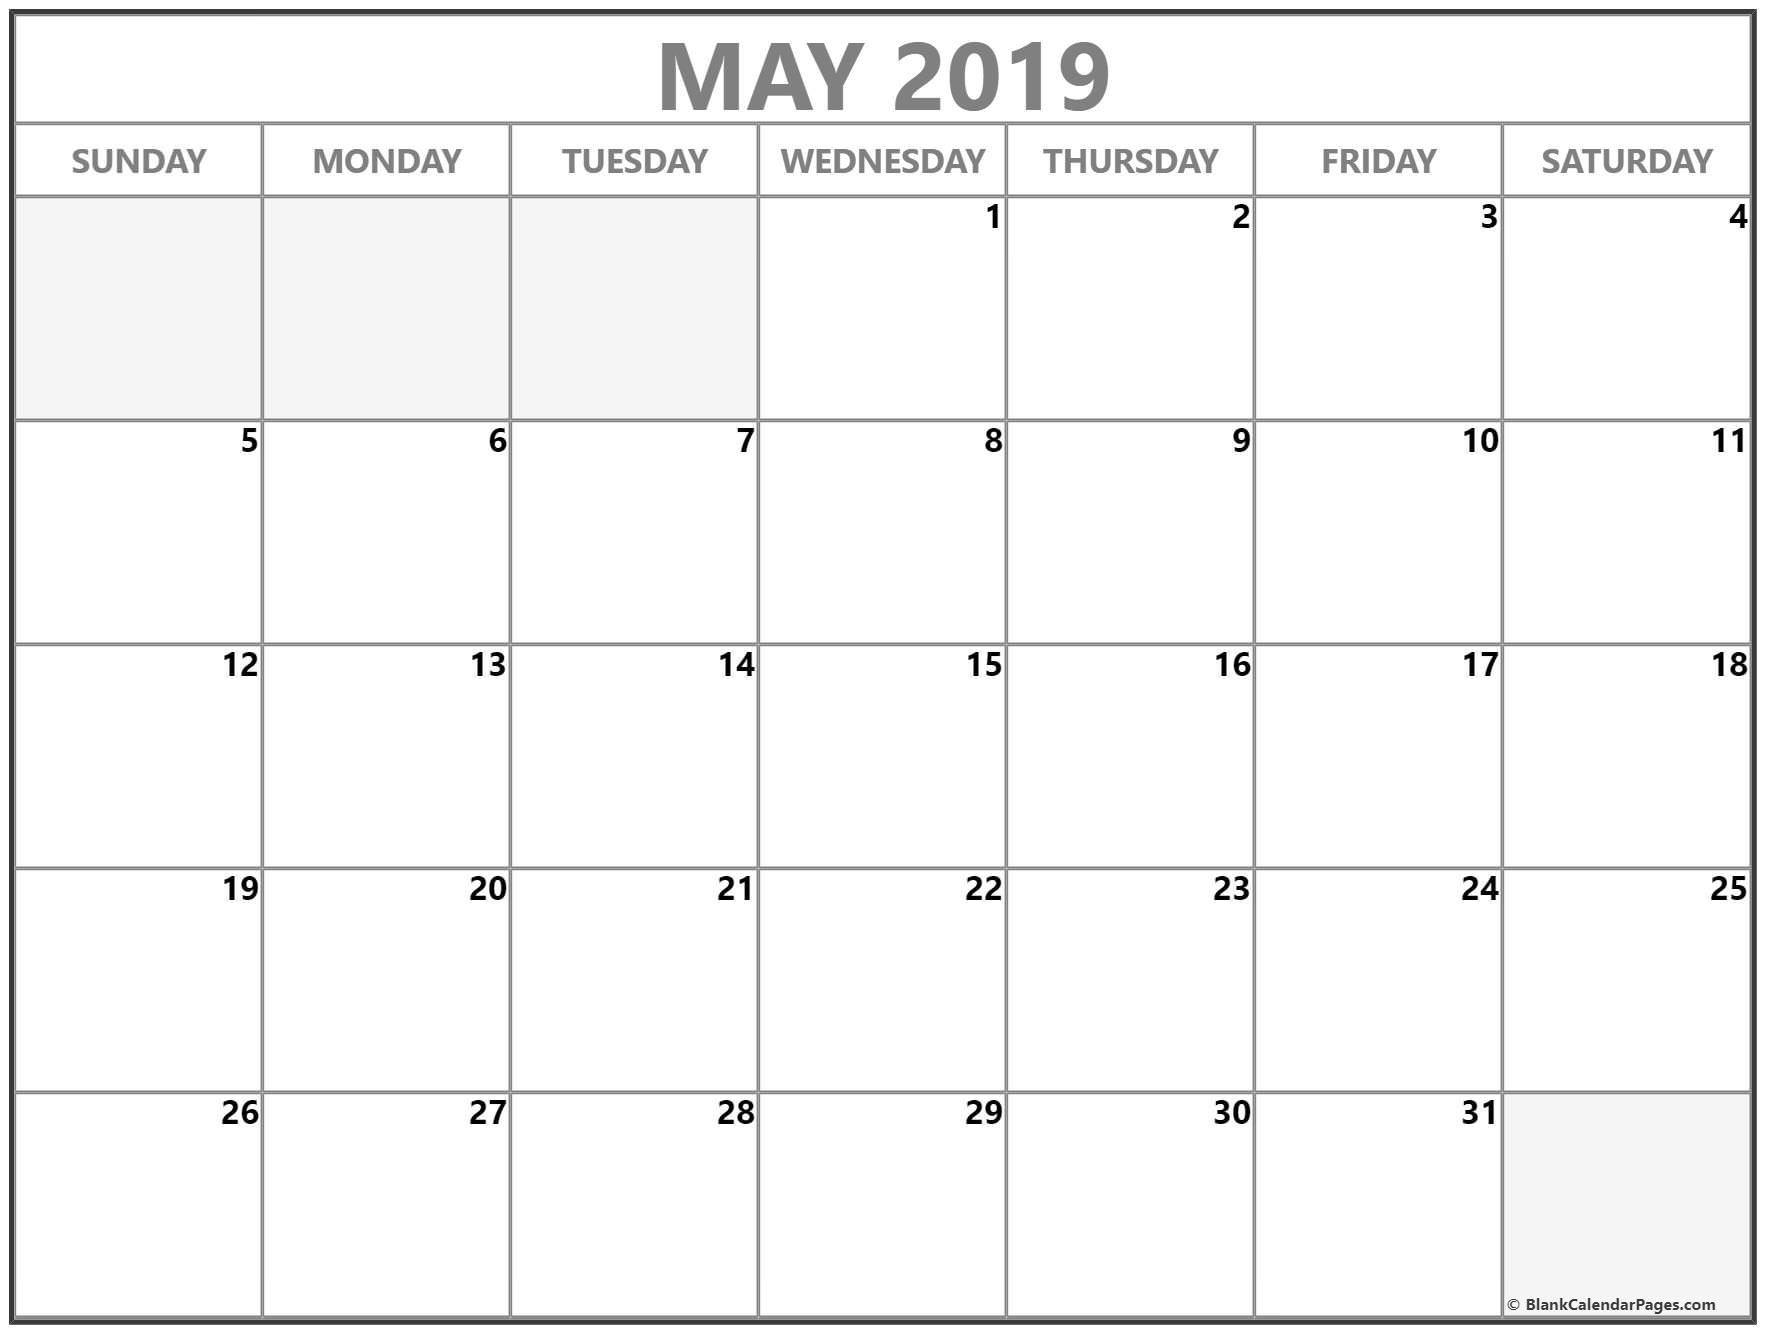 May 2019 Blank Calendar Templates. | Blank Calendar Template, Calendar Printables, Monthly-Free Fillable Calendars 2021